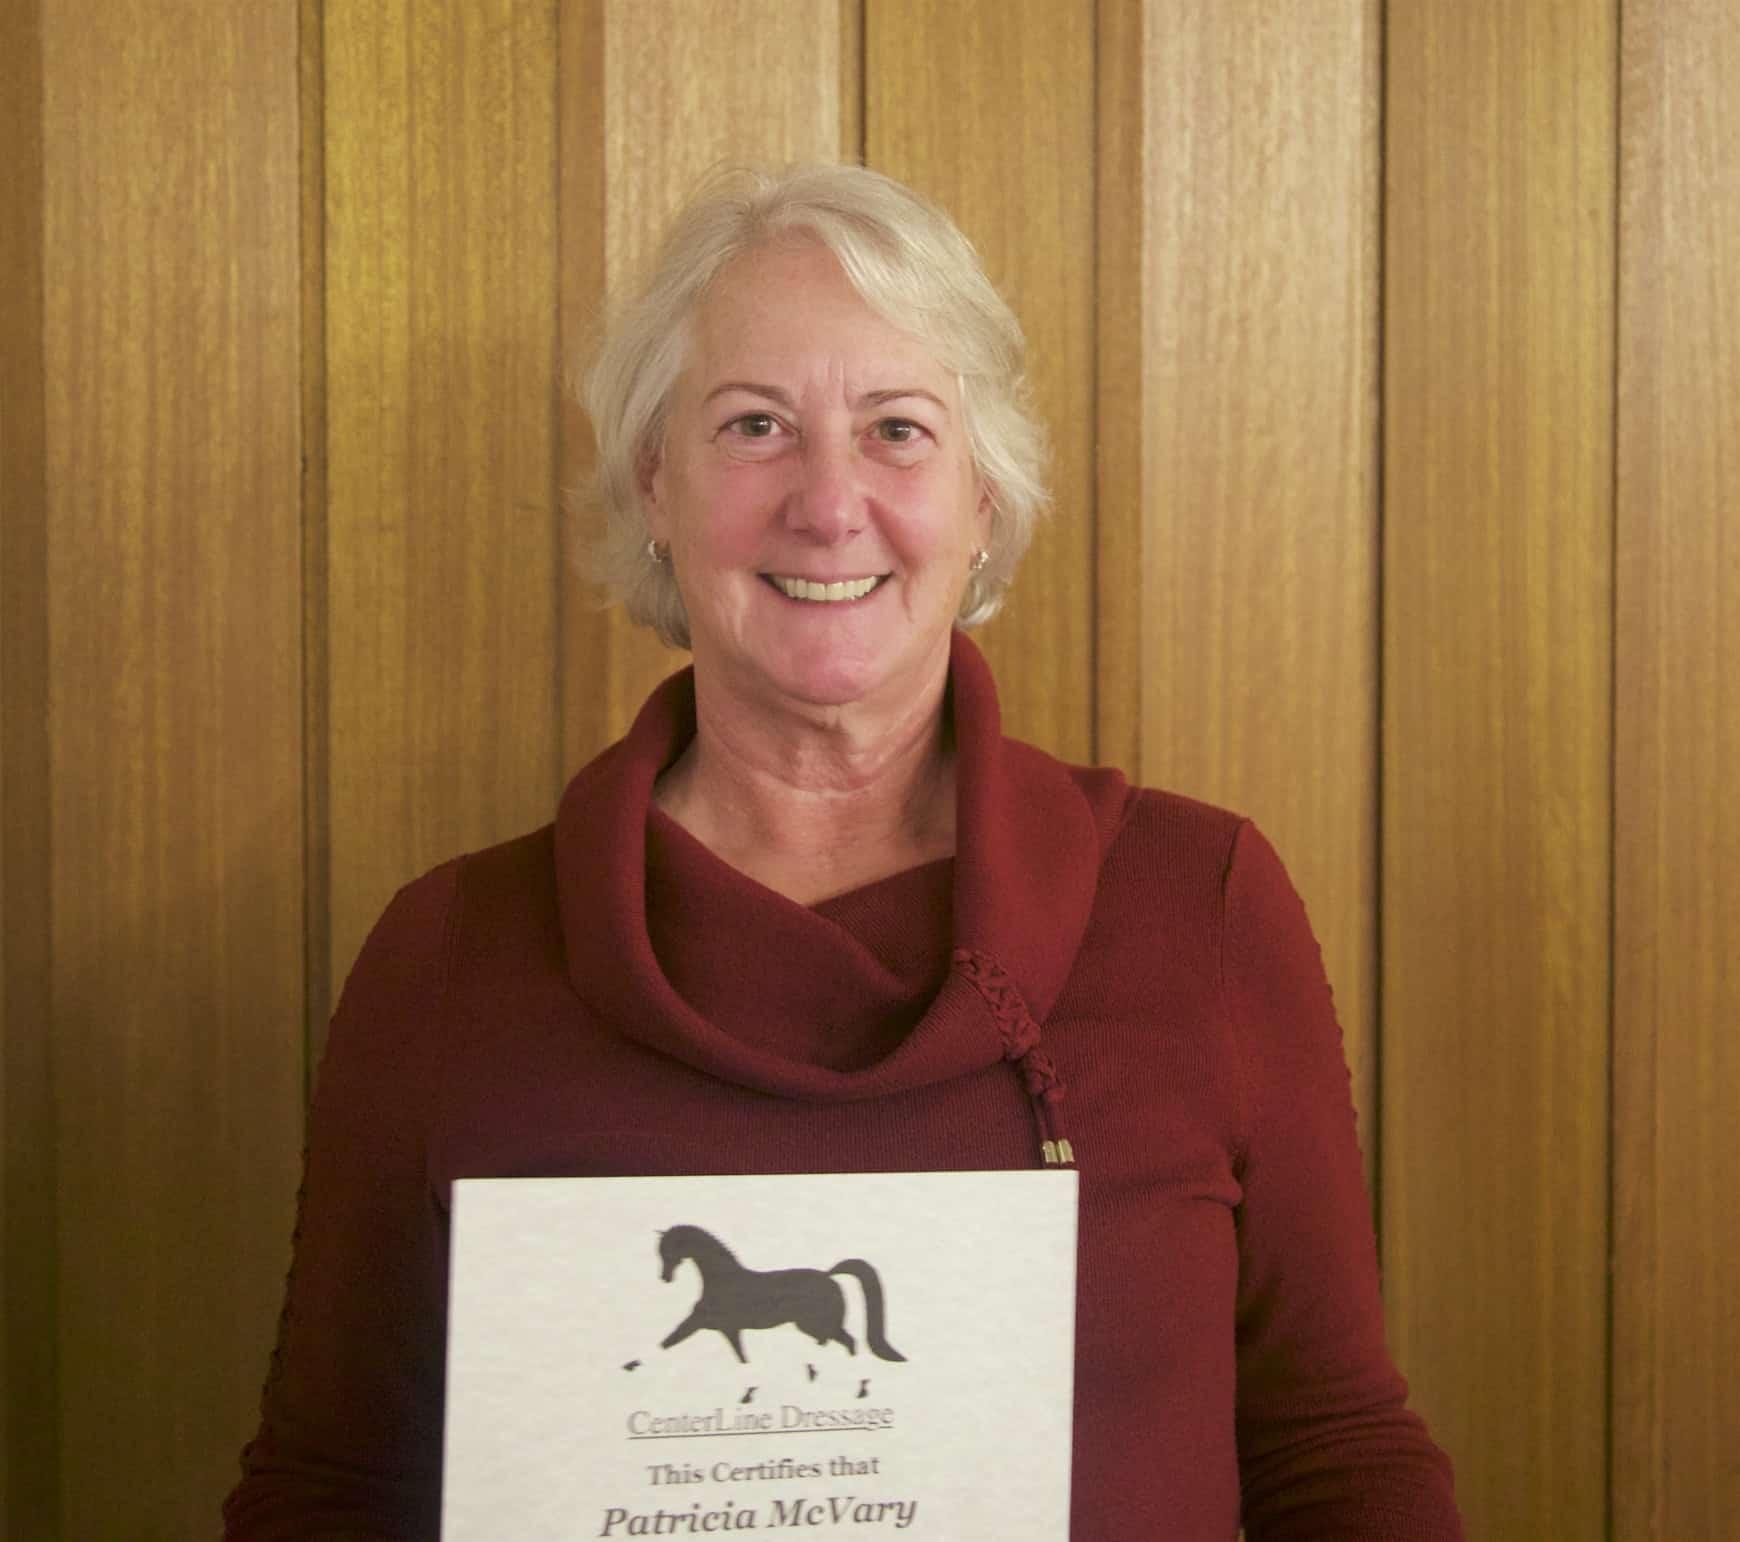 Pat McVary accepts an award